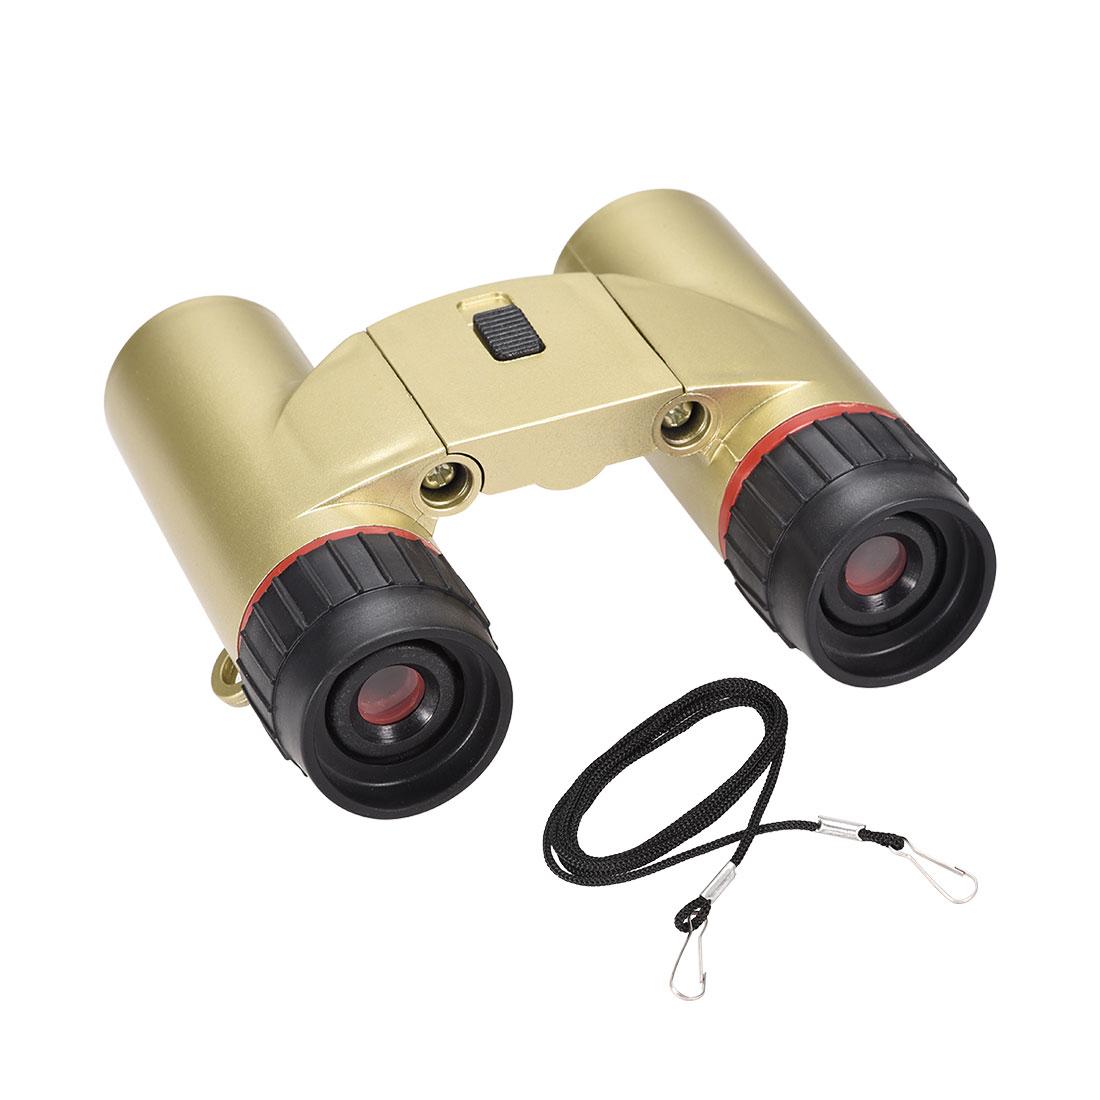 Toy Binoculars 7X30 Compact Foldable Binoculars Gold Tone with LED light